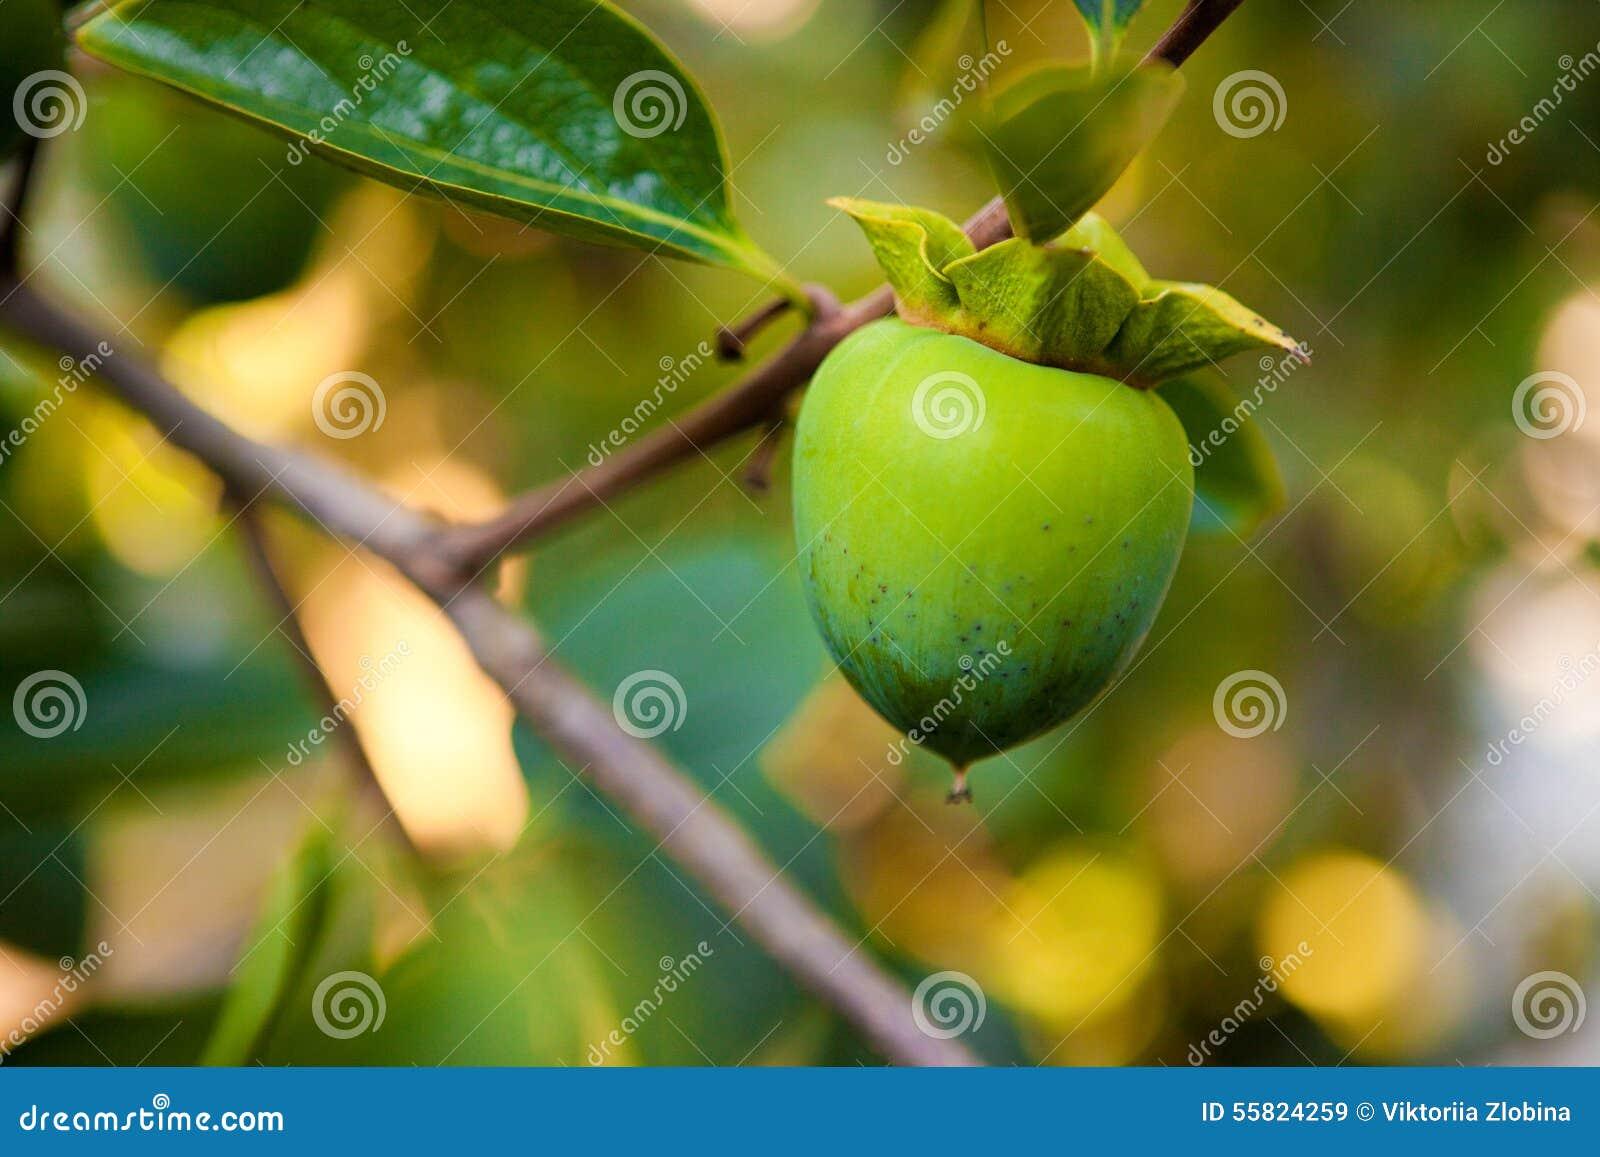 persimmon fruit summer fruits